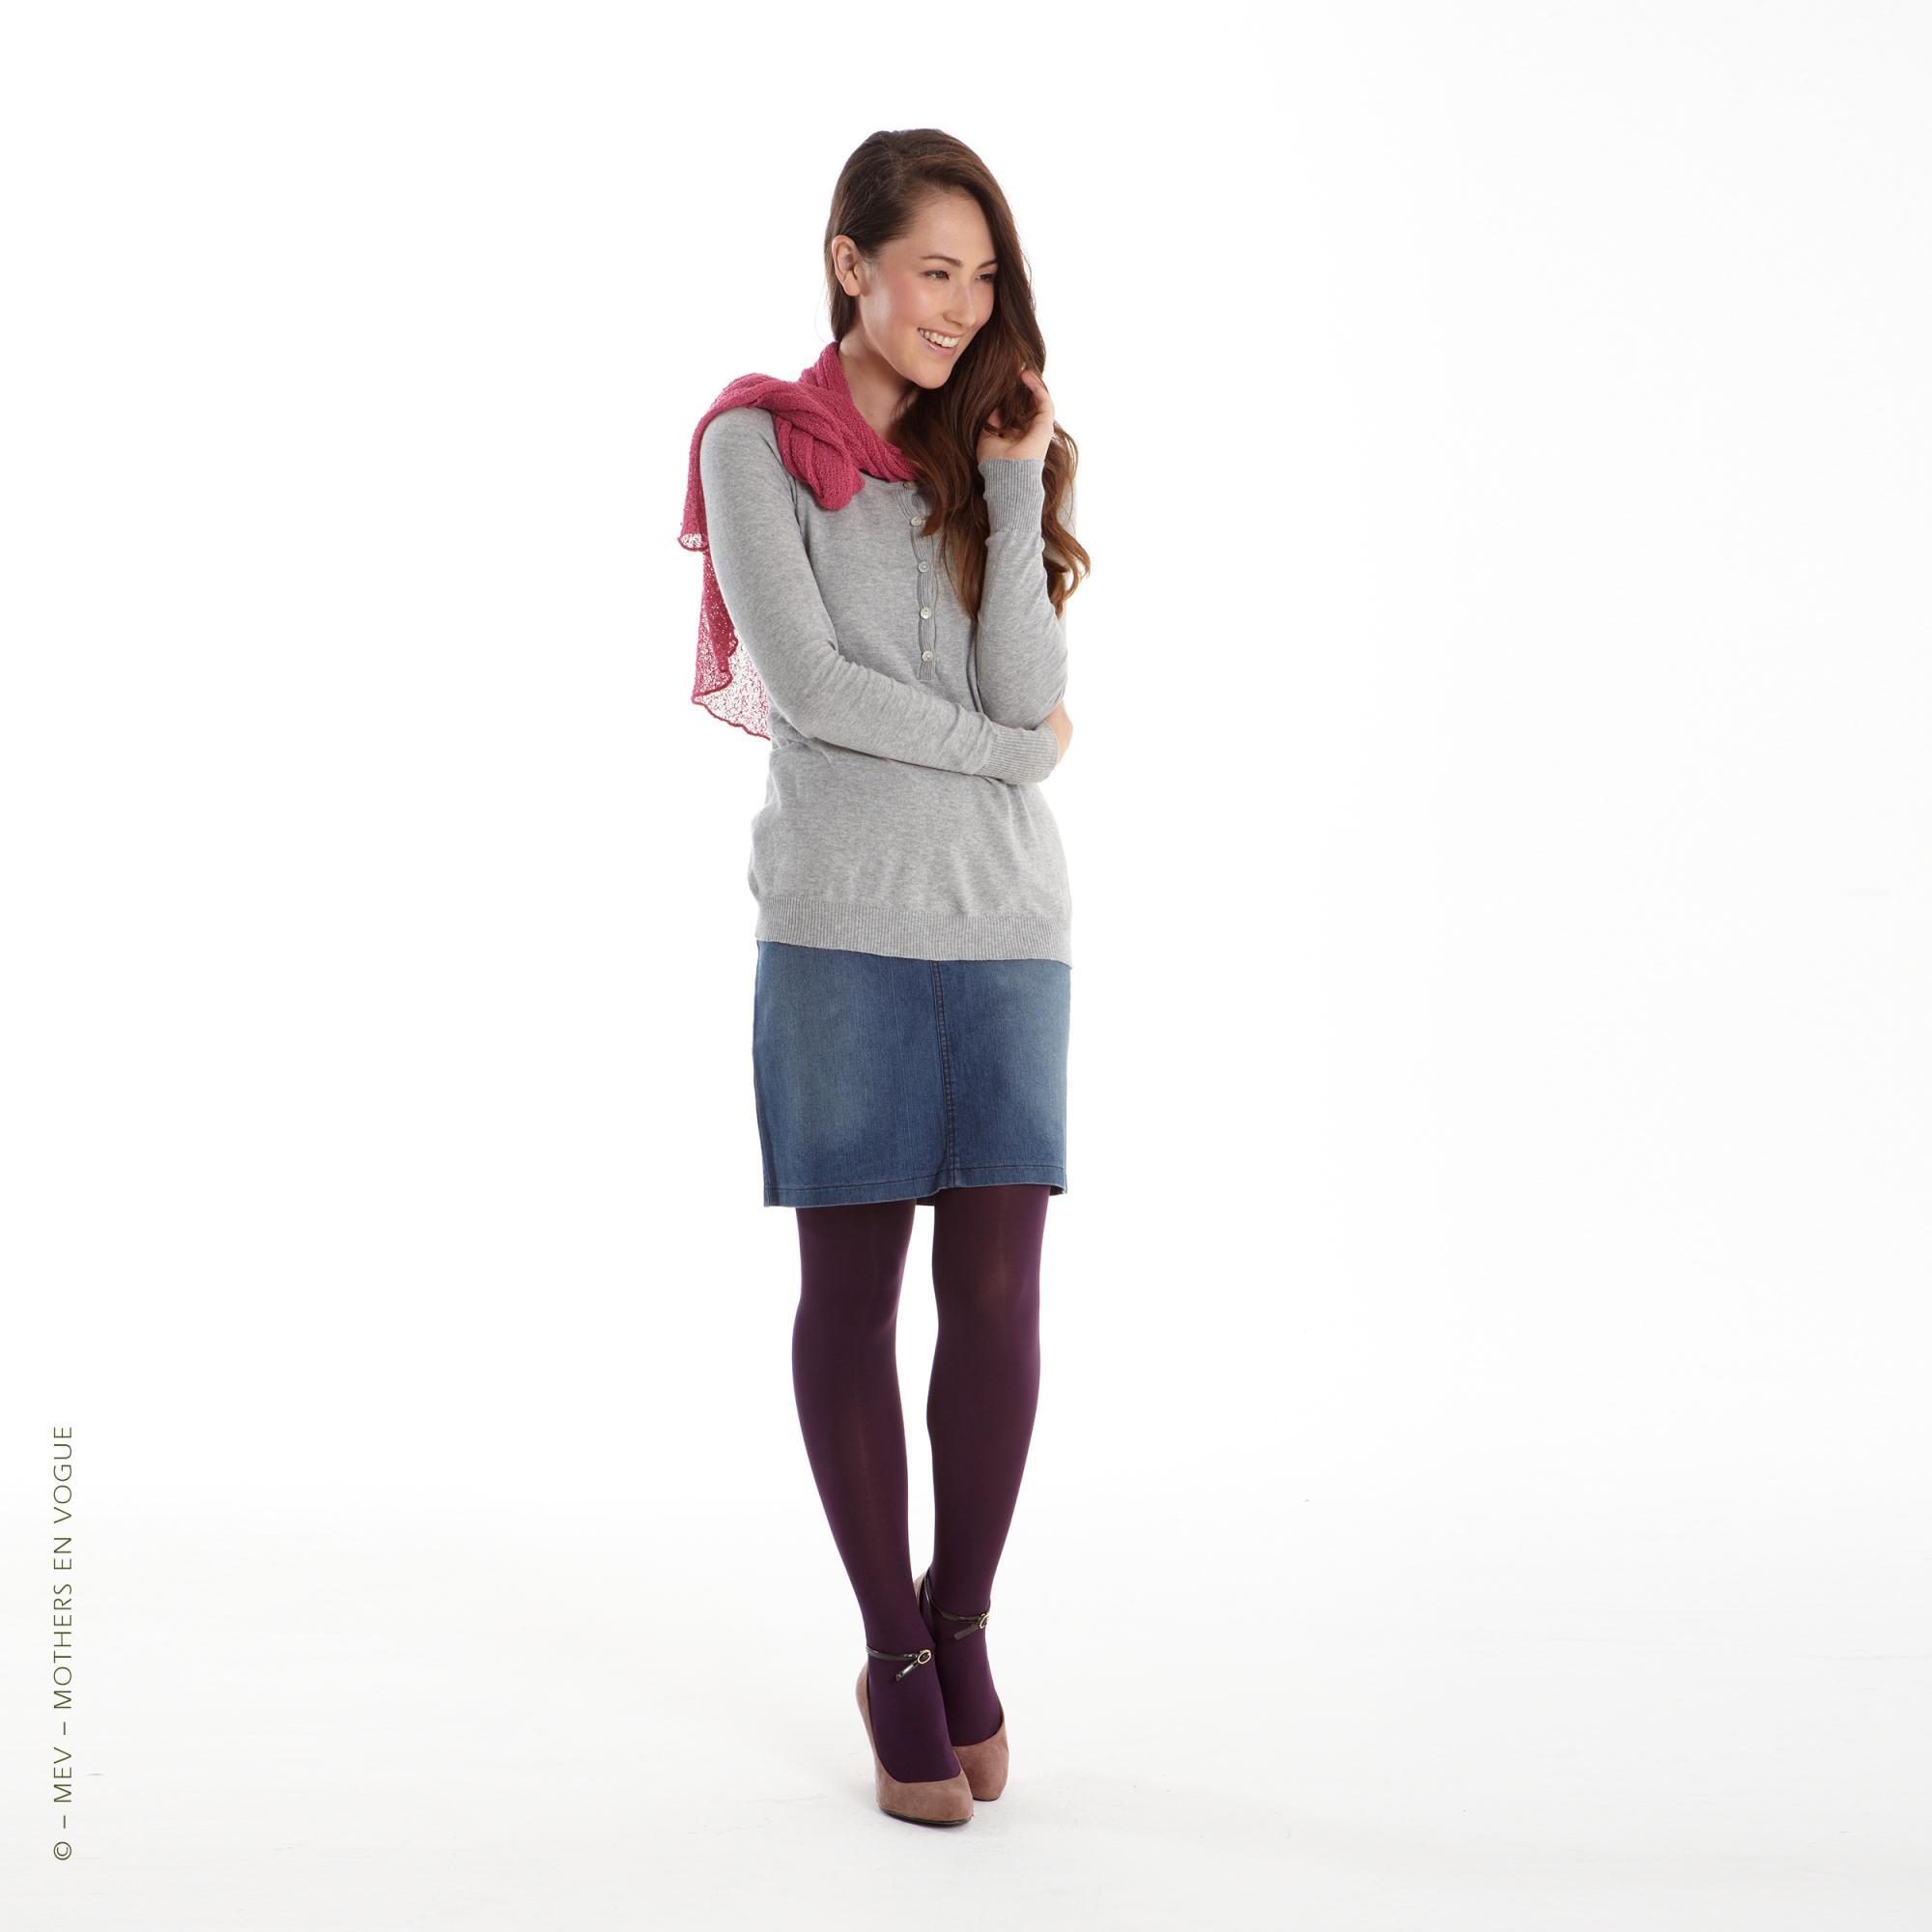 mothers-en-vogue-basic-button-down-nursing-sweater-heather-gray-2.jpg